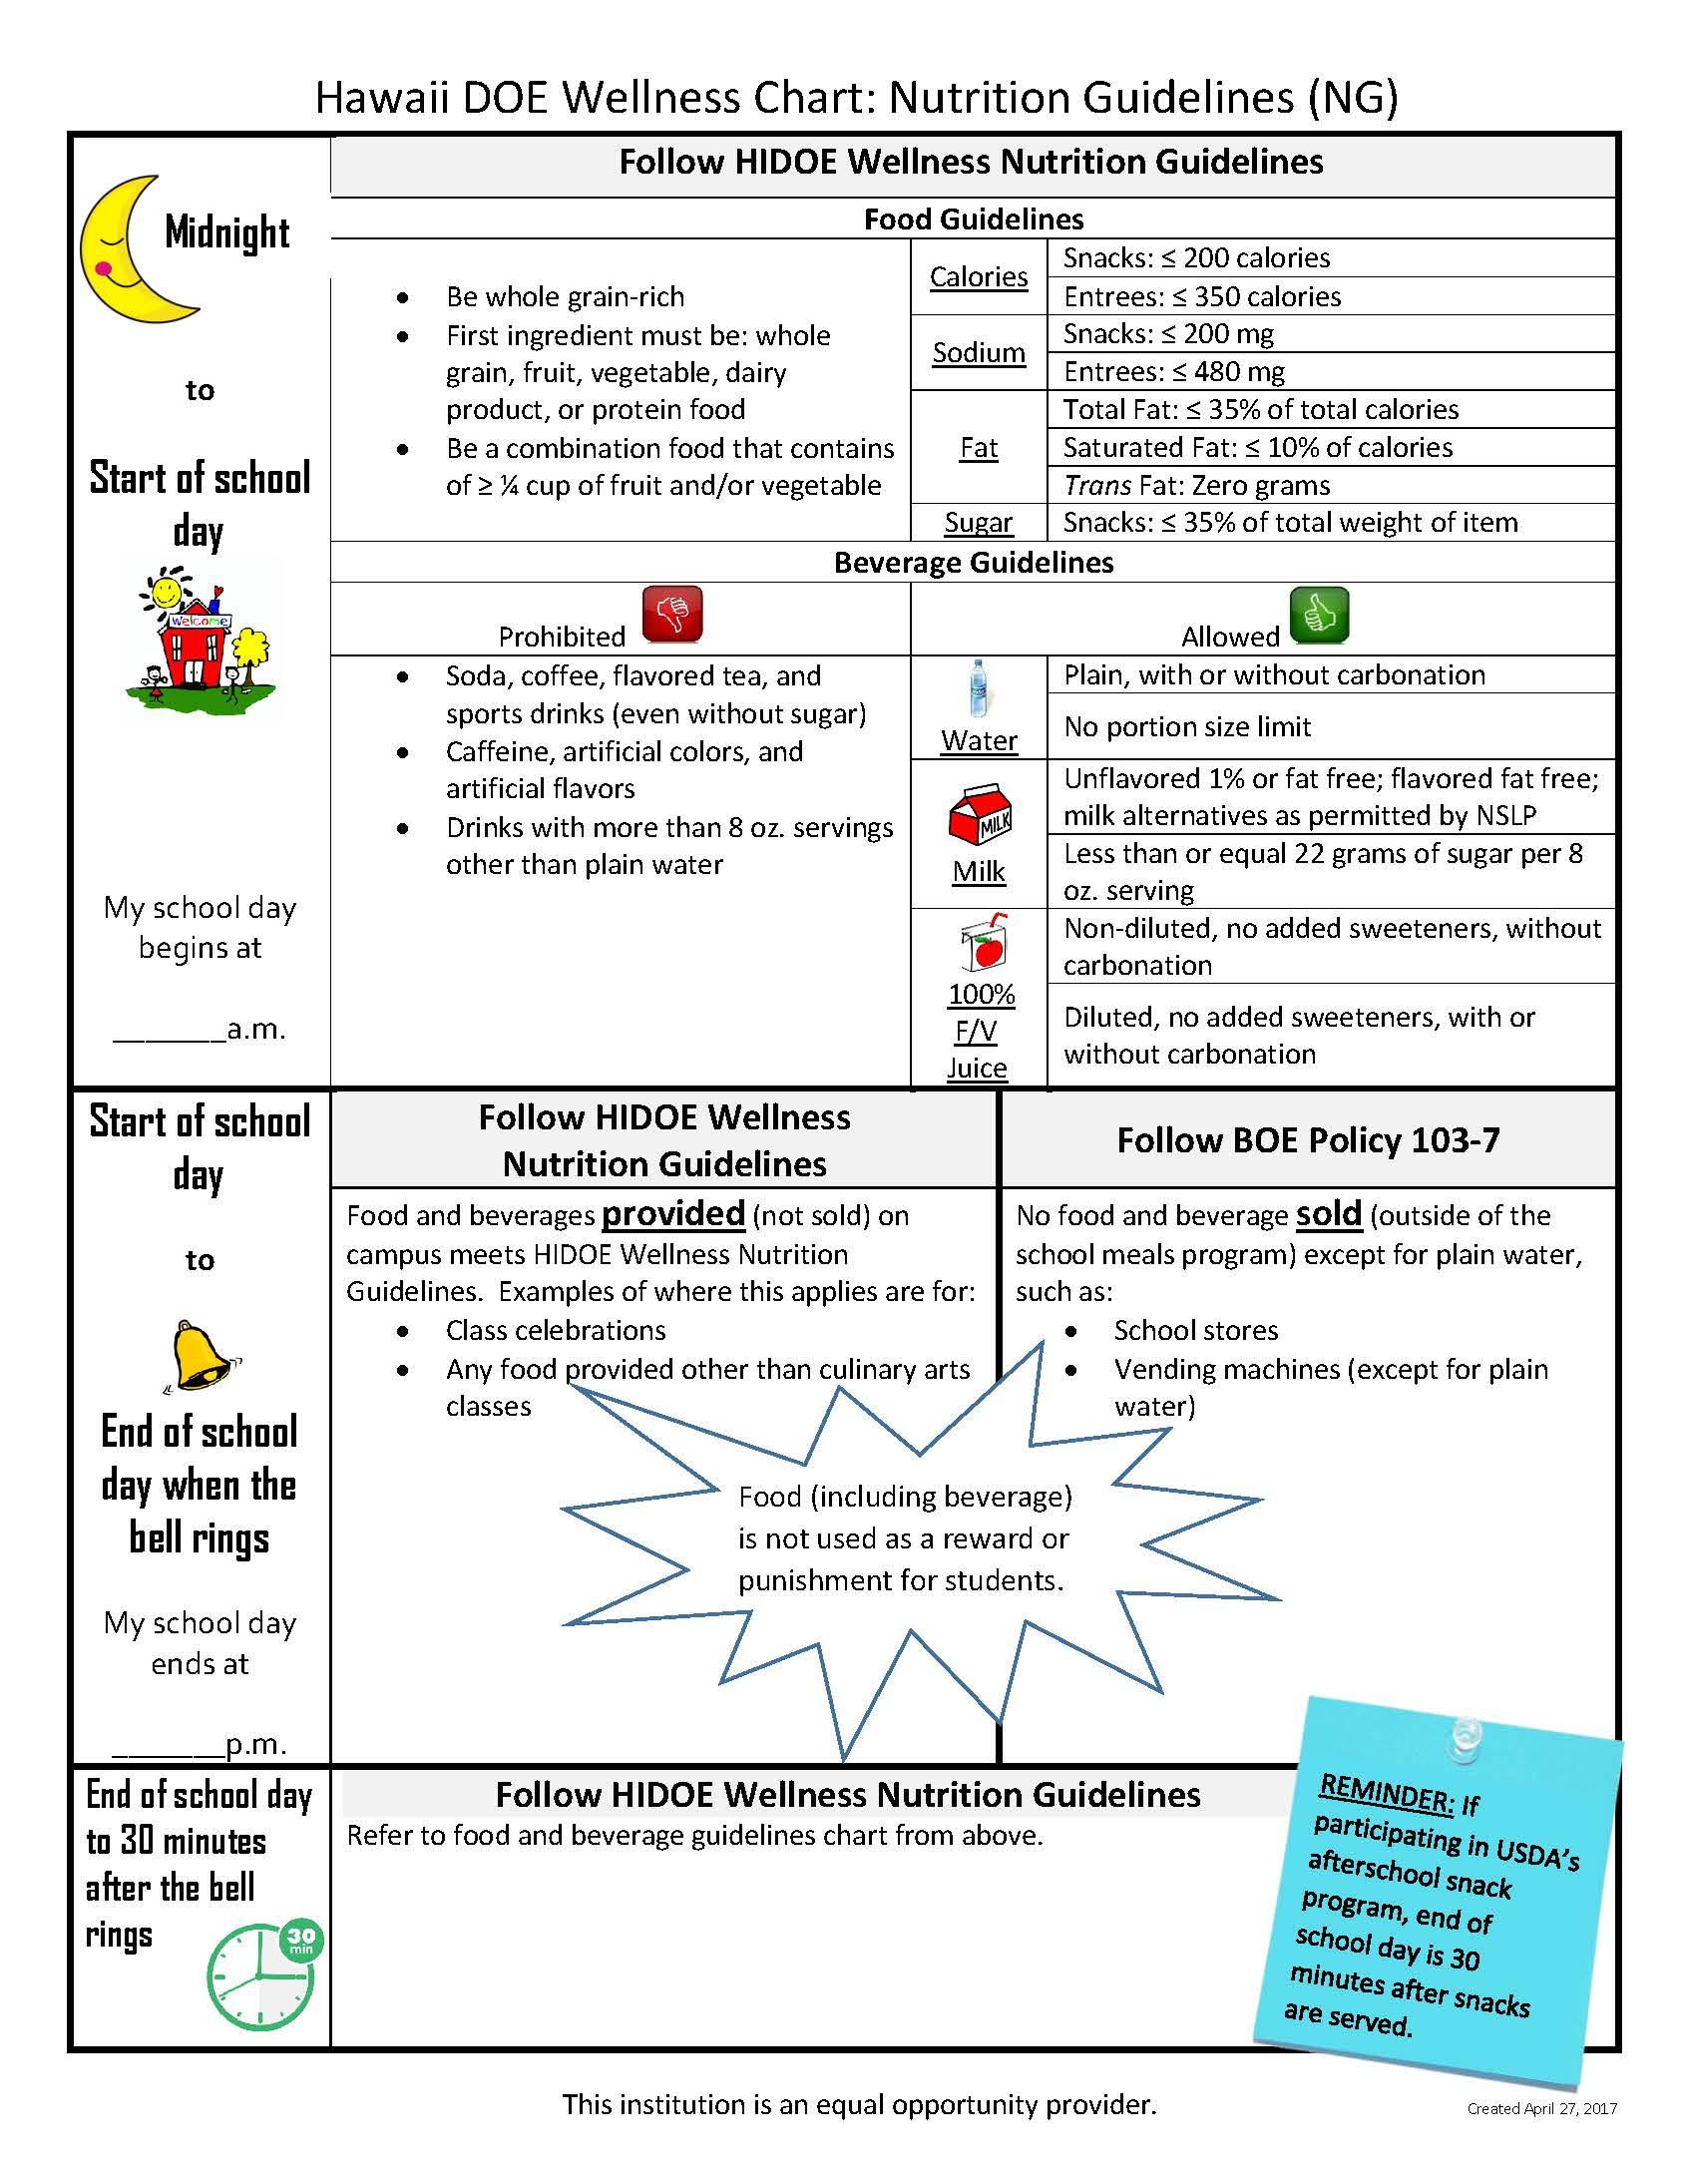 Hawaii Doe | Nutrition Guidelines For Food, Beverages Pertaining To Doe State Of Hawaii School Calendar